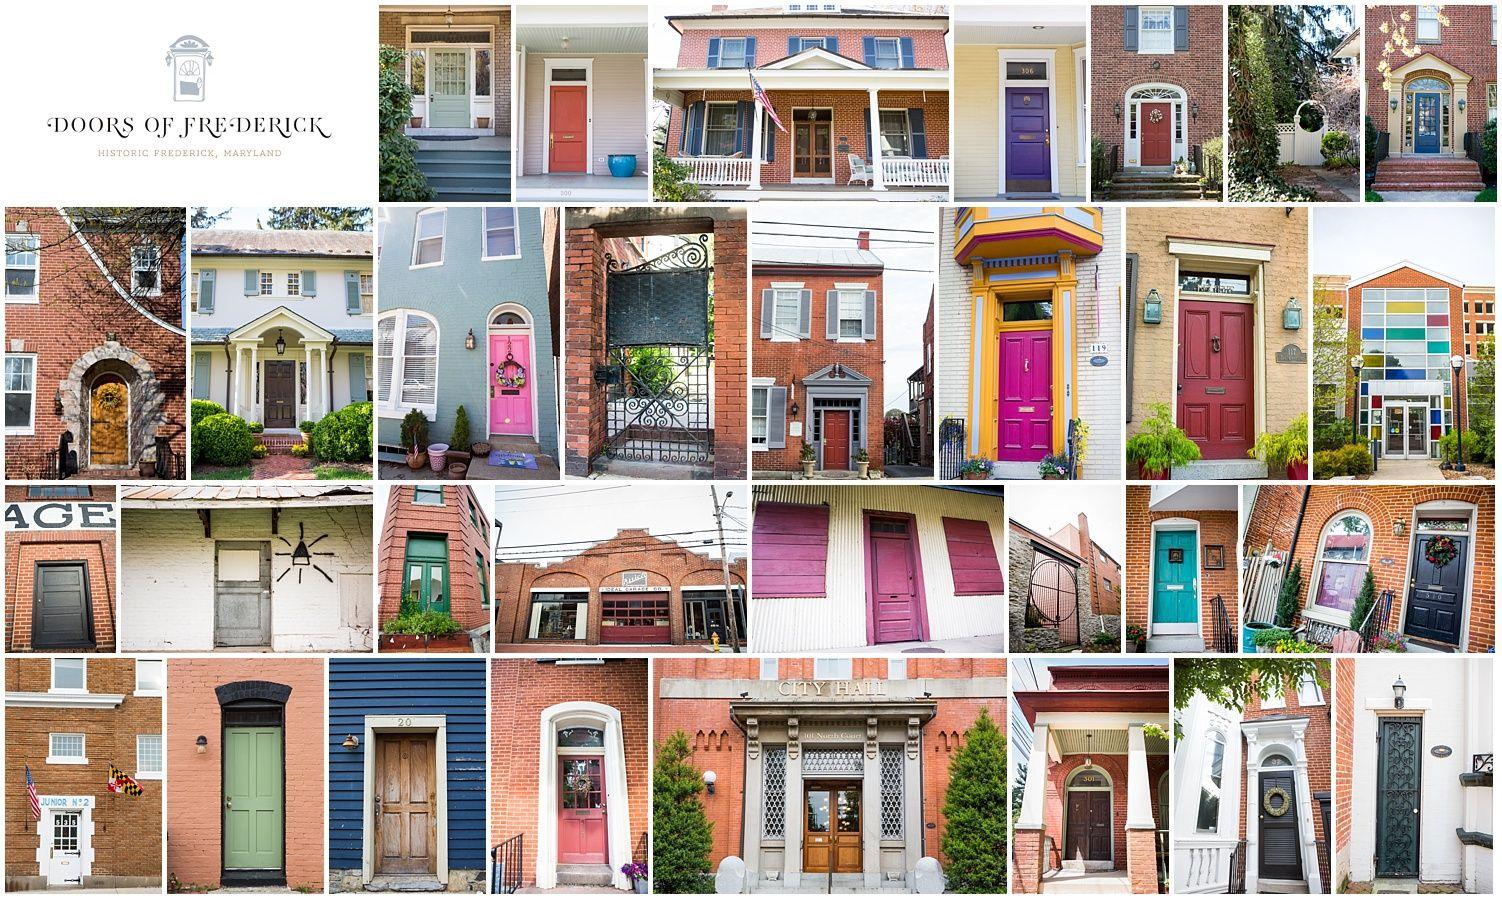 Frederick maryland doors doors of frederick photo